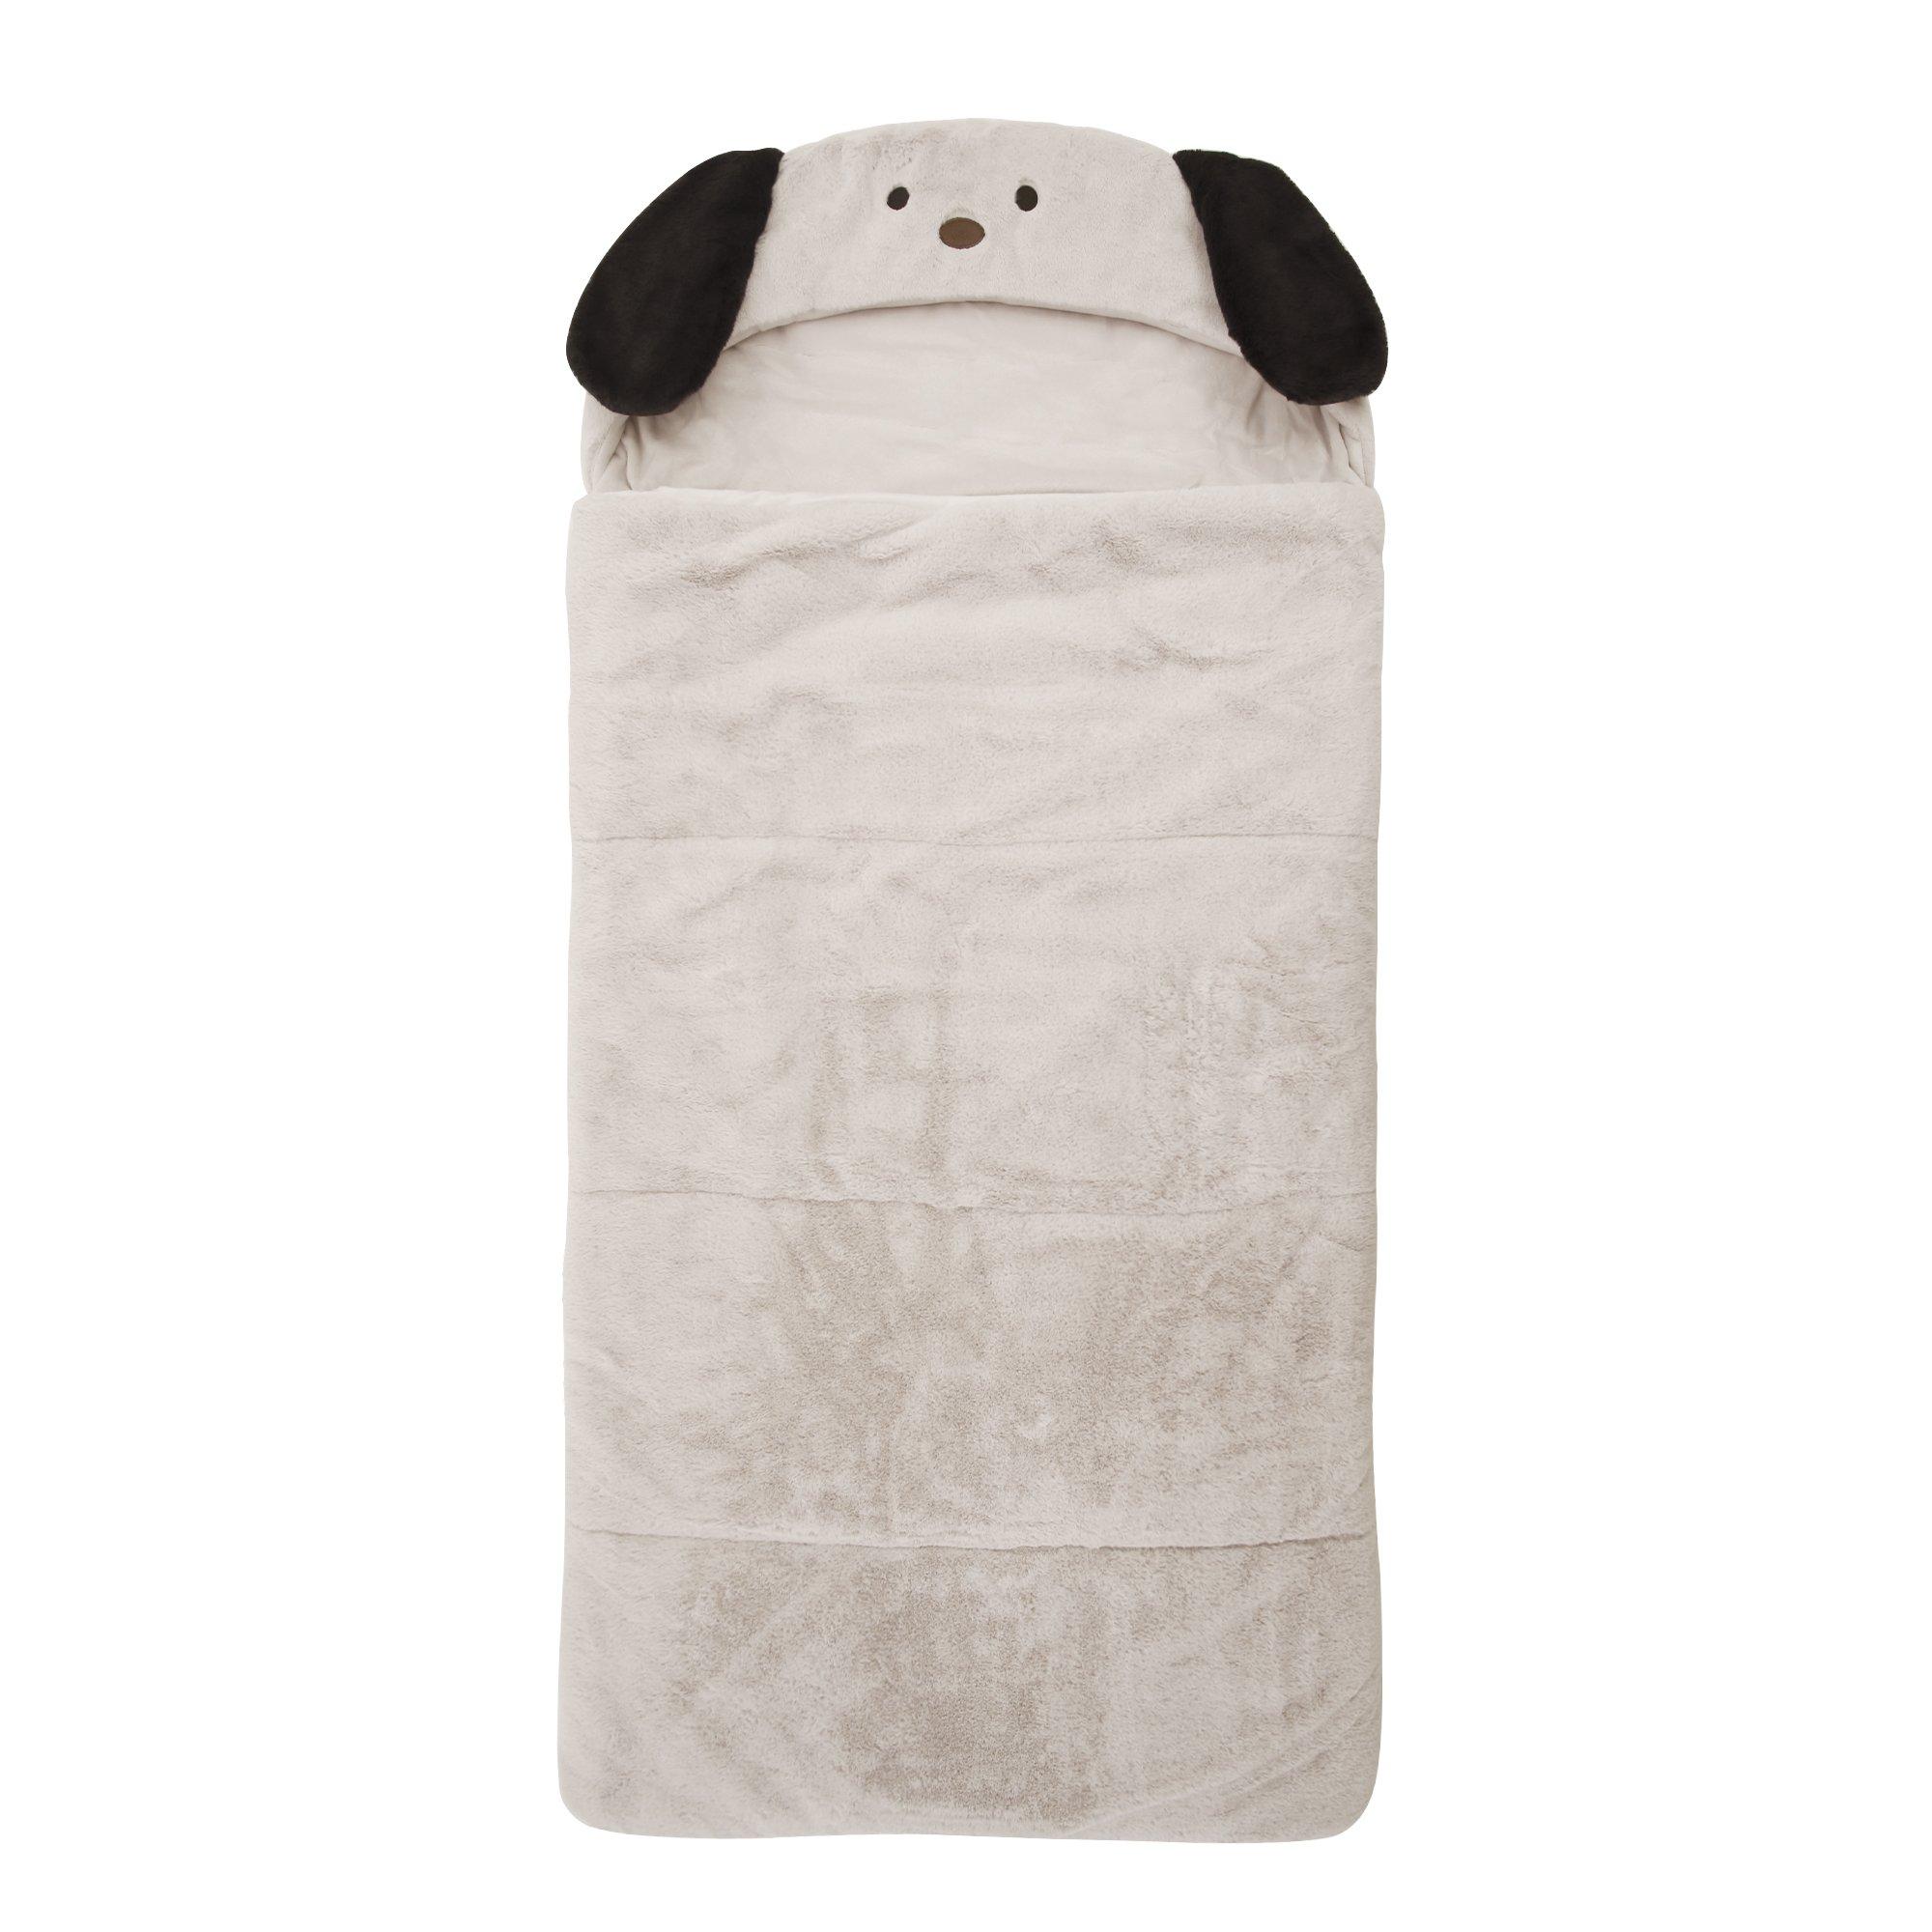 Best Home Fashion Plush Faux Fur Hooded Dog Animal Sleeping Bag - Taupe - 27''W x 59''L - (1 Sleeping Bag) by Best Home Fashion (Image #1)